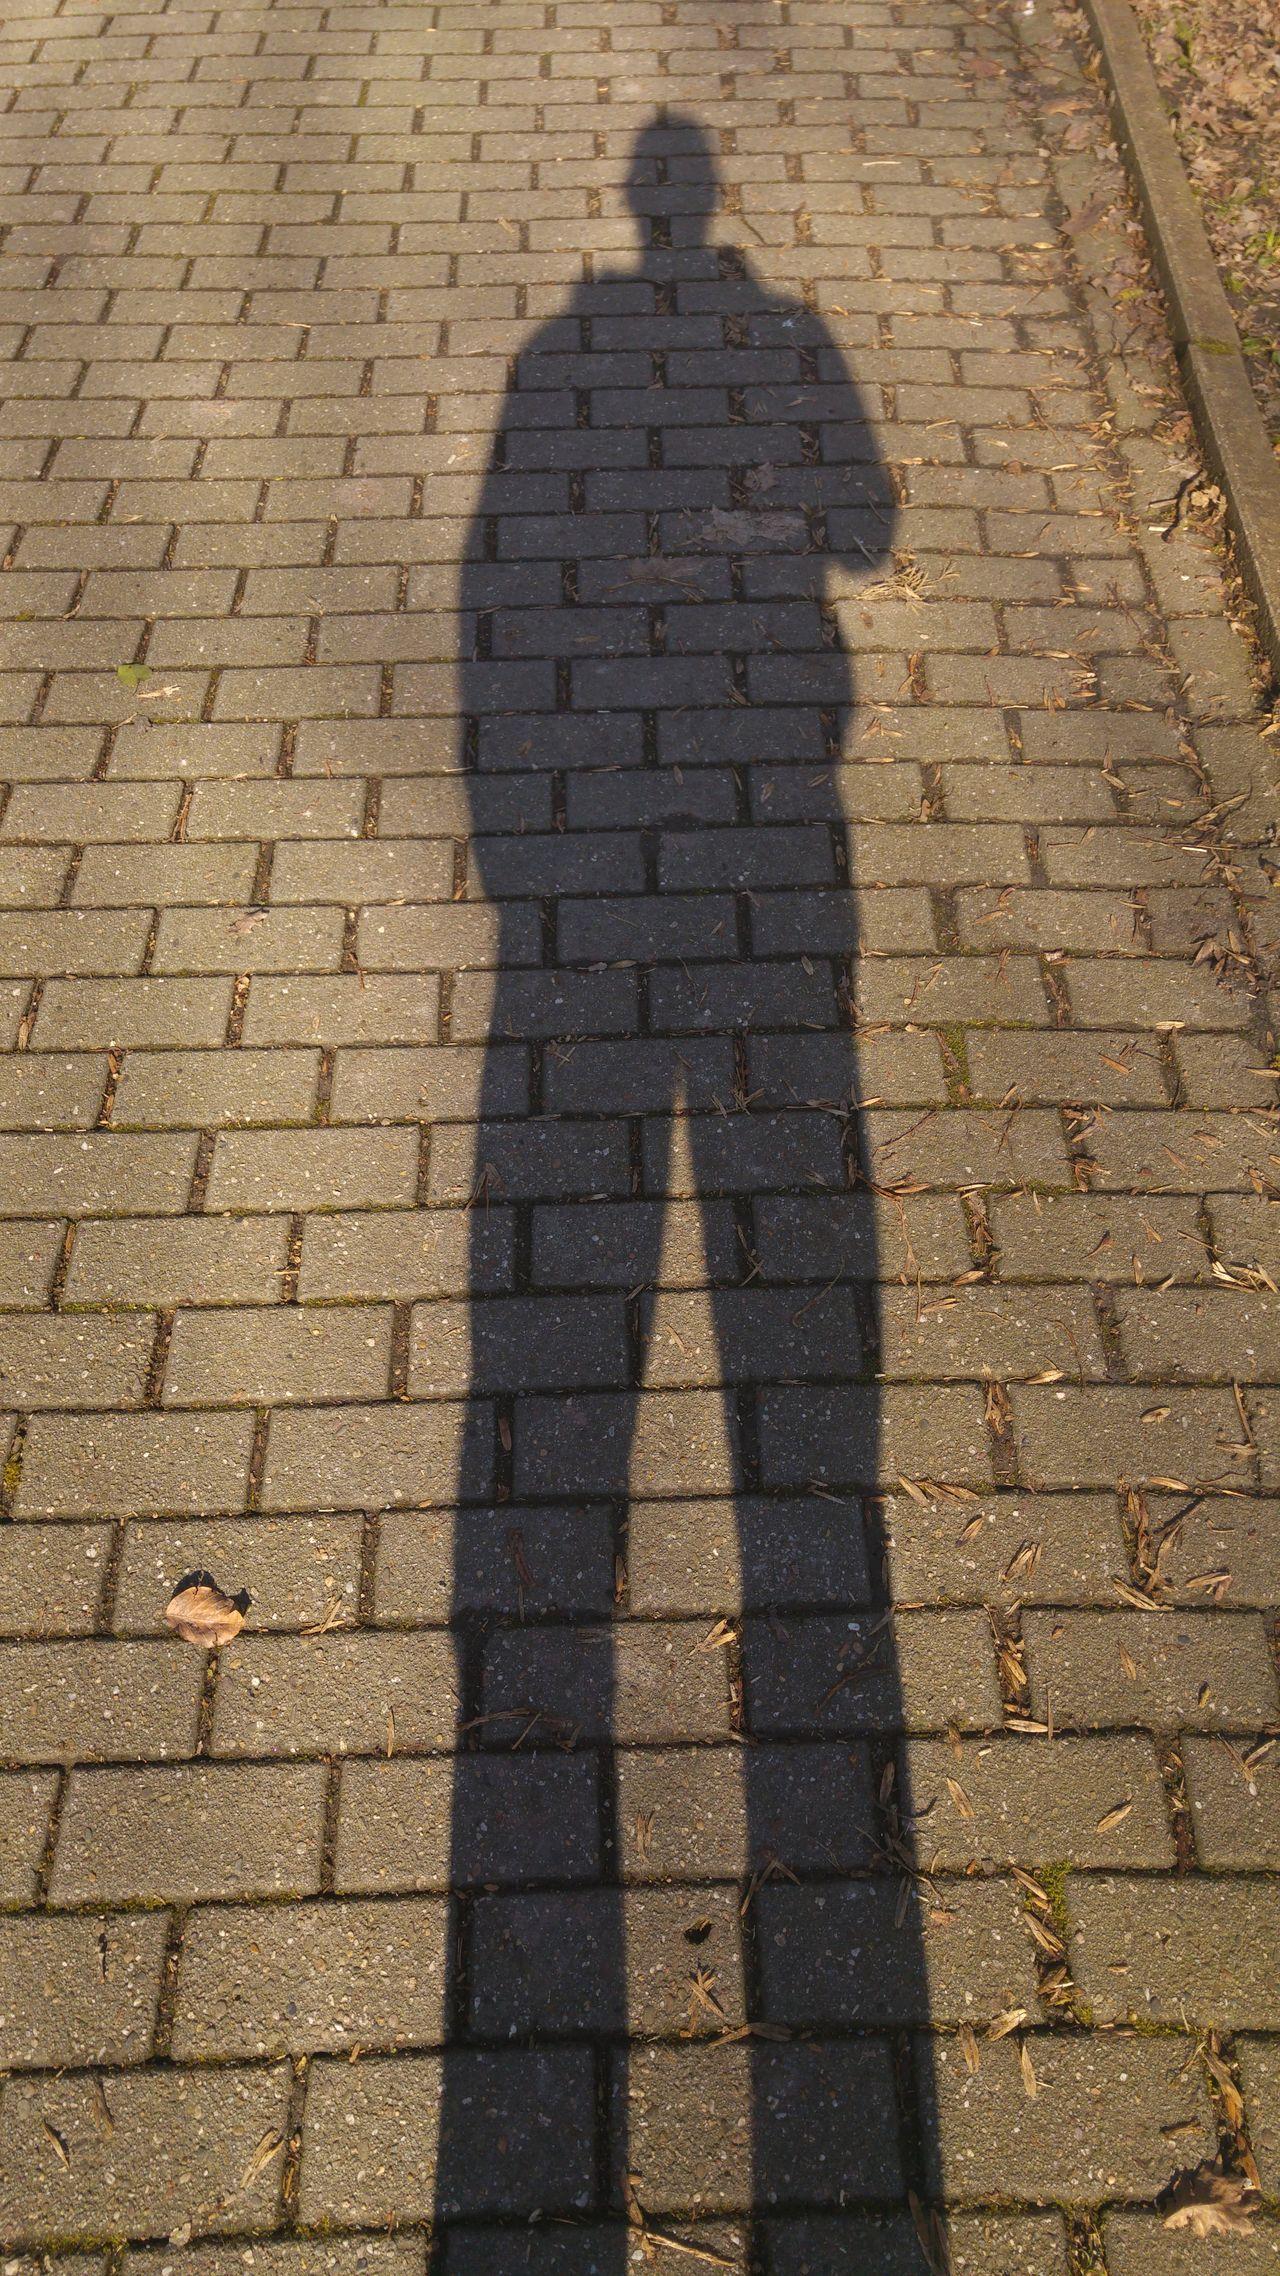 It's Me Me MemyselfandI Selfie ✌ Shadow Play ShadowSelfie Ground Shadowonground Shadowonfloor Myshadow Goingforawalk Park Kurpark  LG G4 Eye4photography  Germany GERMANY🇩🇪DEUTSCHERLAND@ Noedit Nofilter Handyphoto